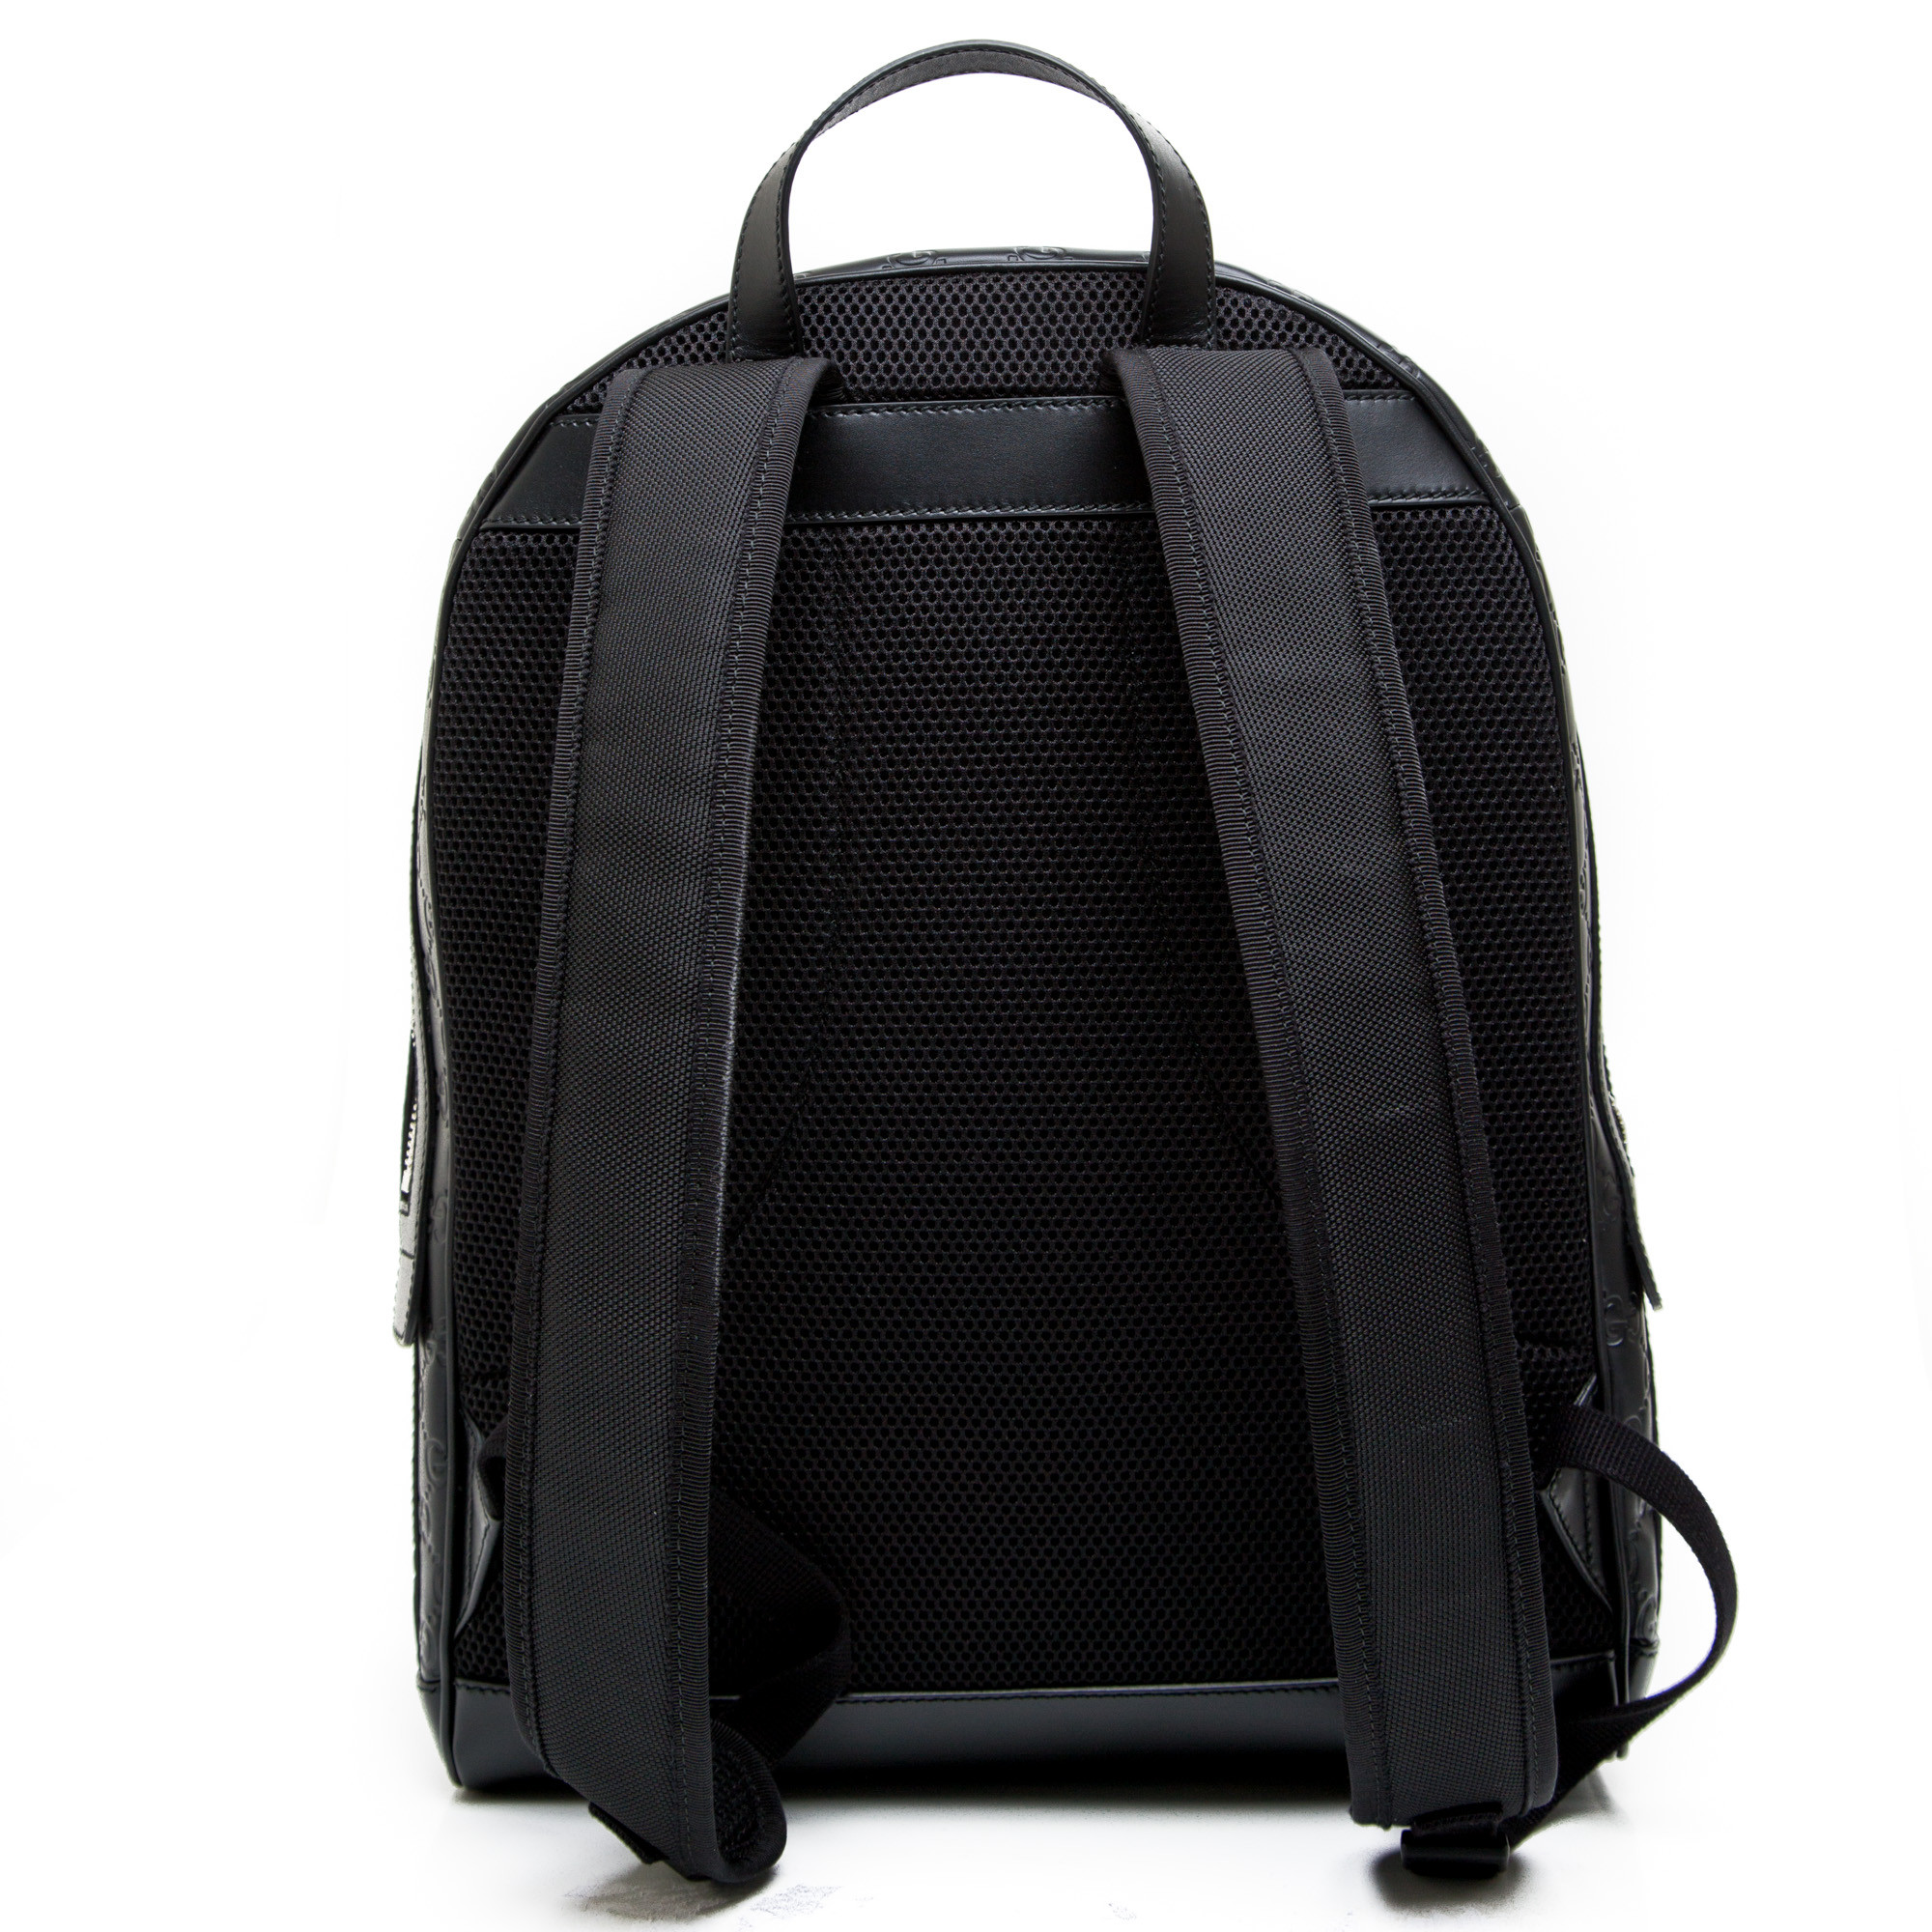 db6db4c2fb ... Gucci backpack gucci signature zwart ...